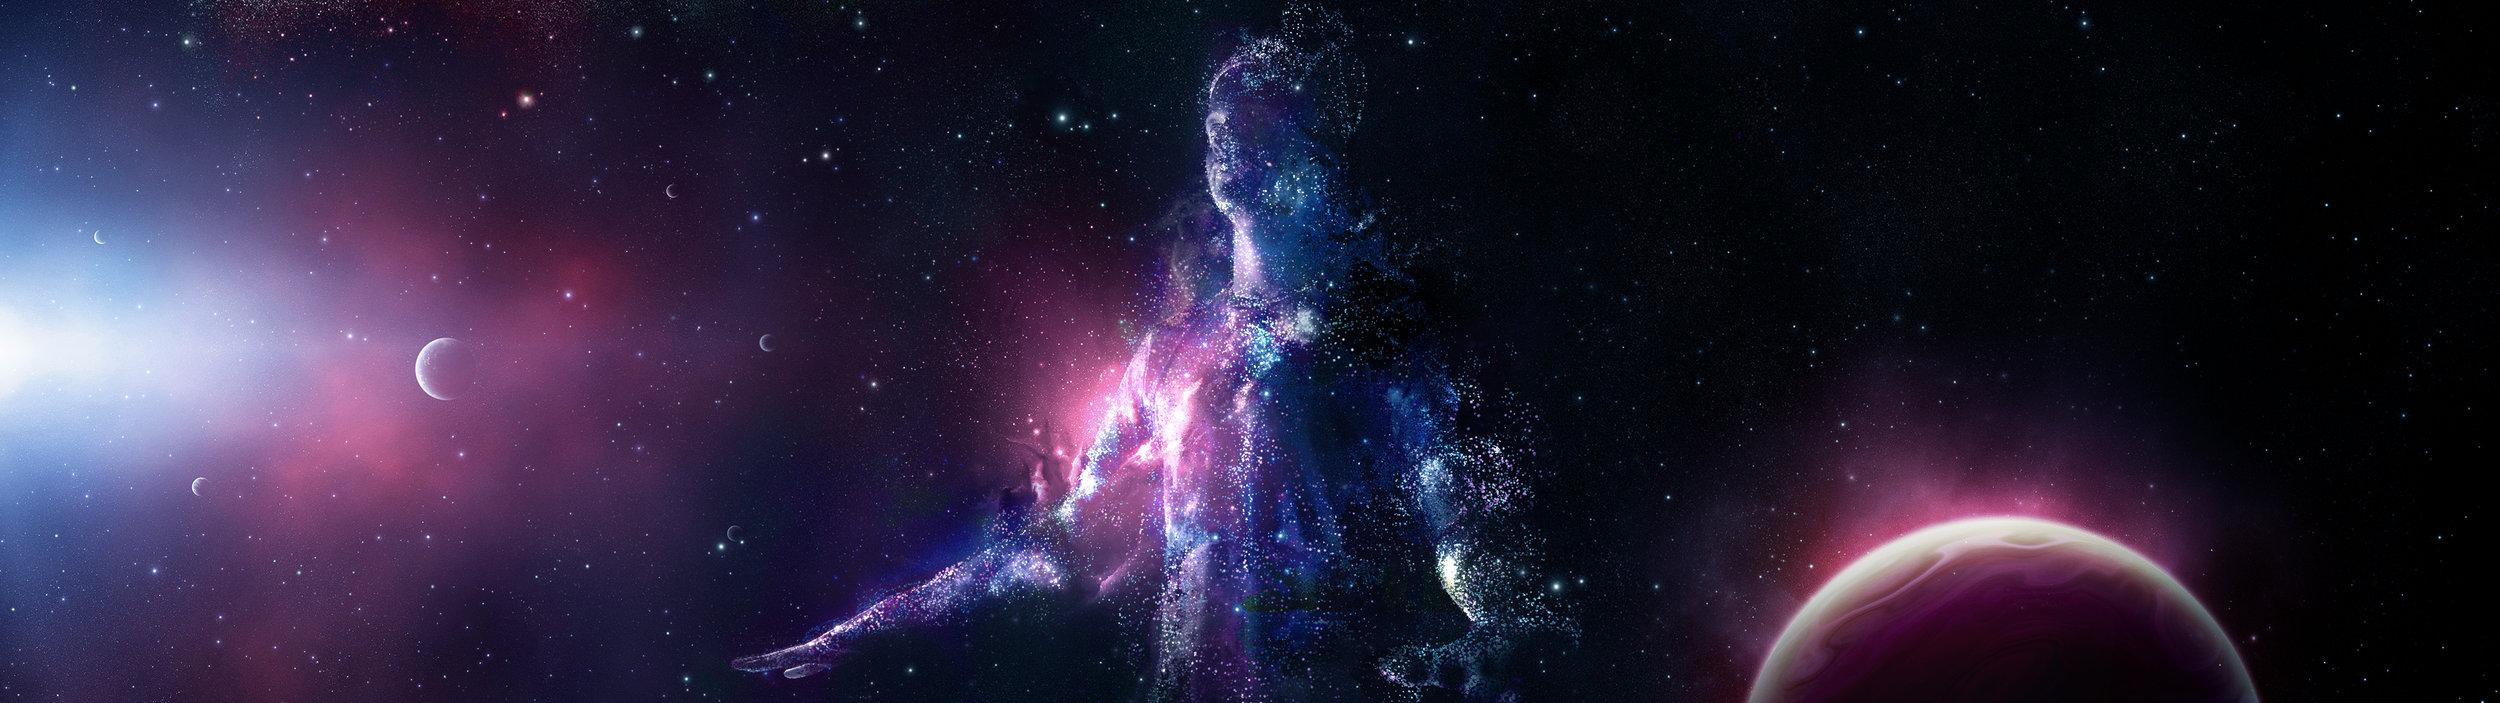 Kygo_Space_Design05.jpg